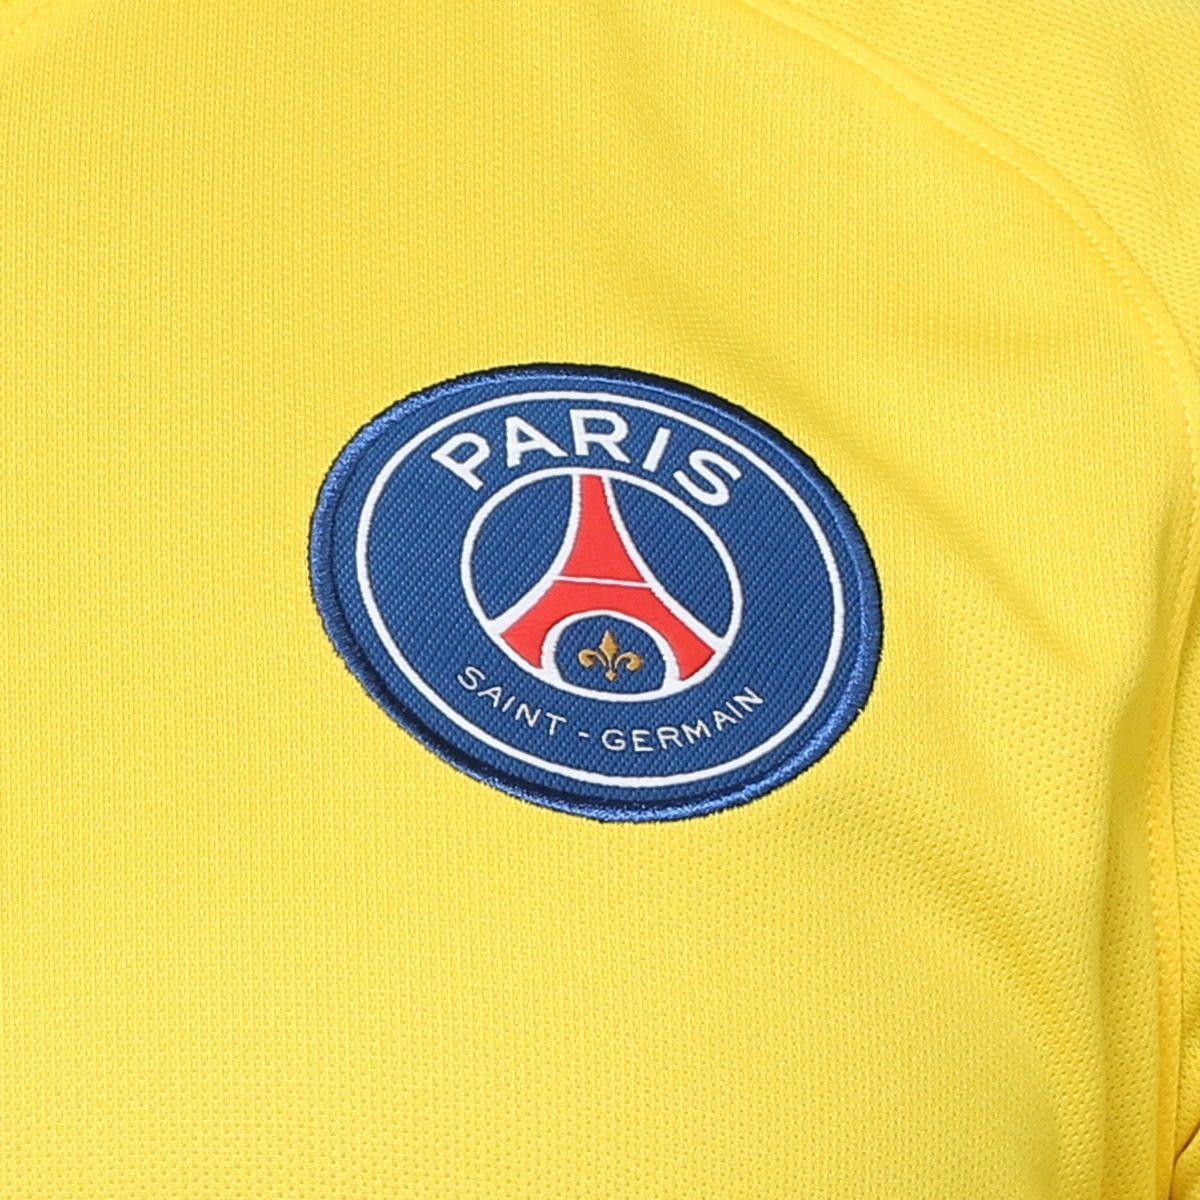 d72b10ccfbbb0 camisa paris saint germain away 17/18 nº 10 neymar jr torced. Carregando  zoom.